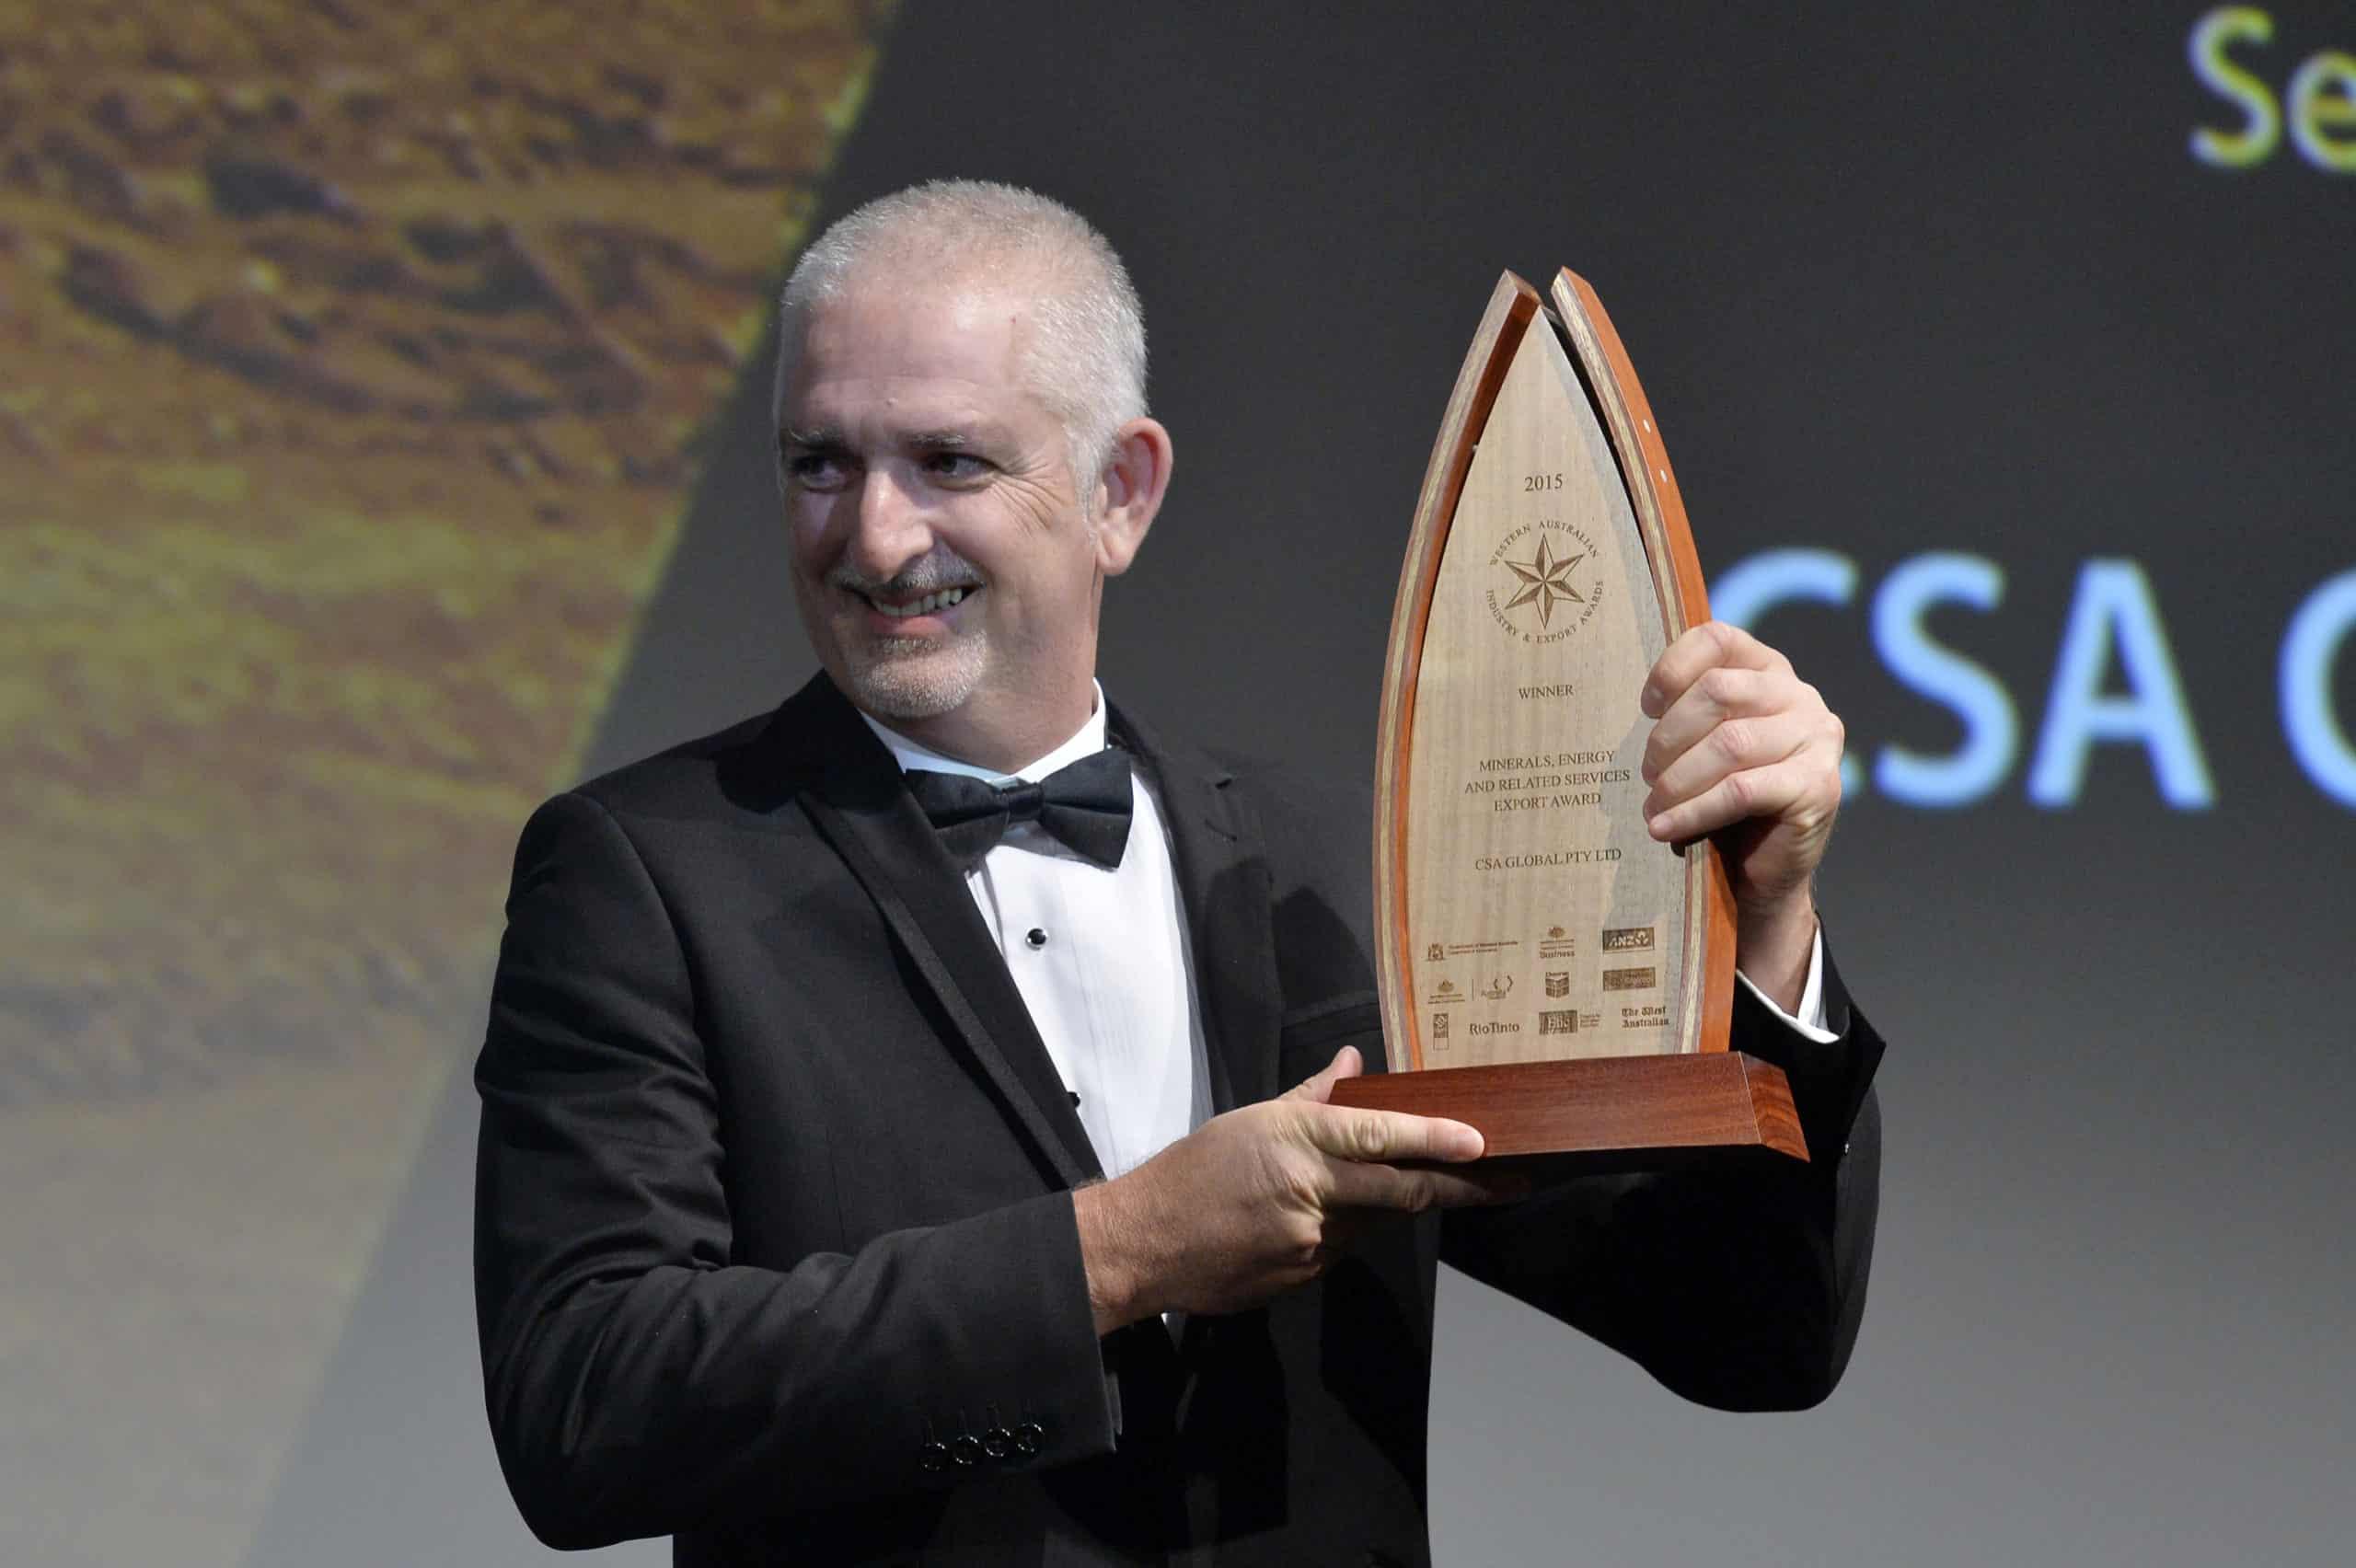 Jeff with 2015 WESTERN AUSTRALIAN EXPORT AWARD